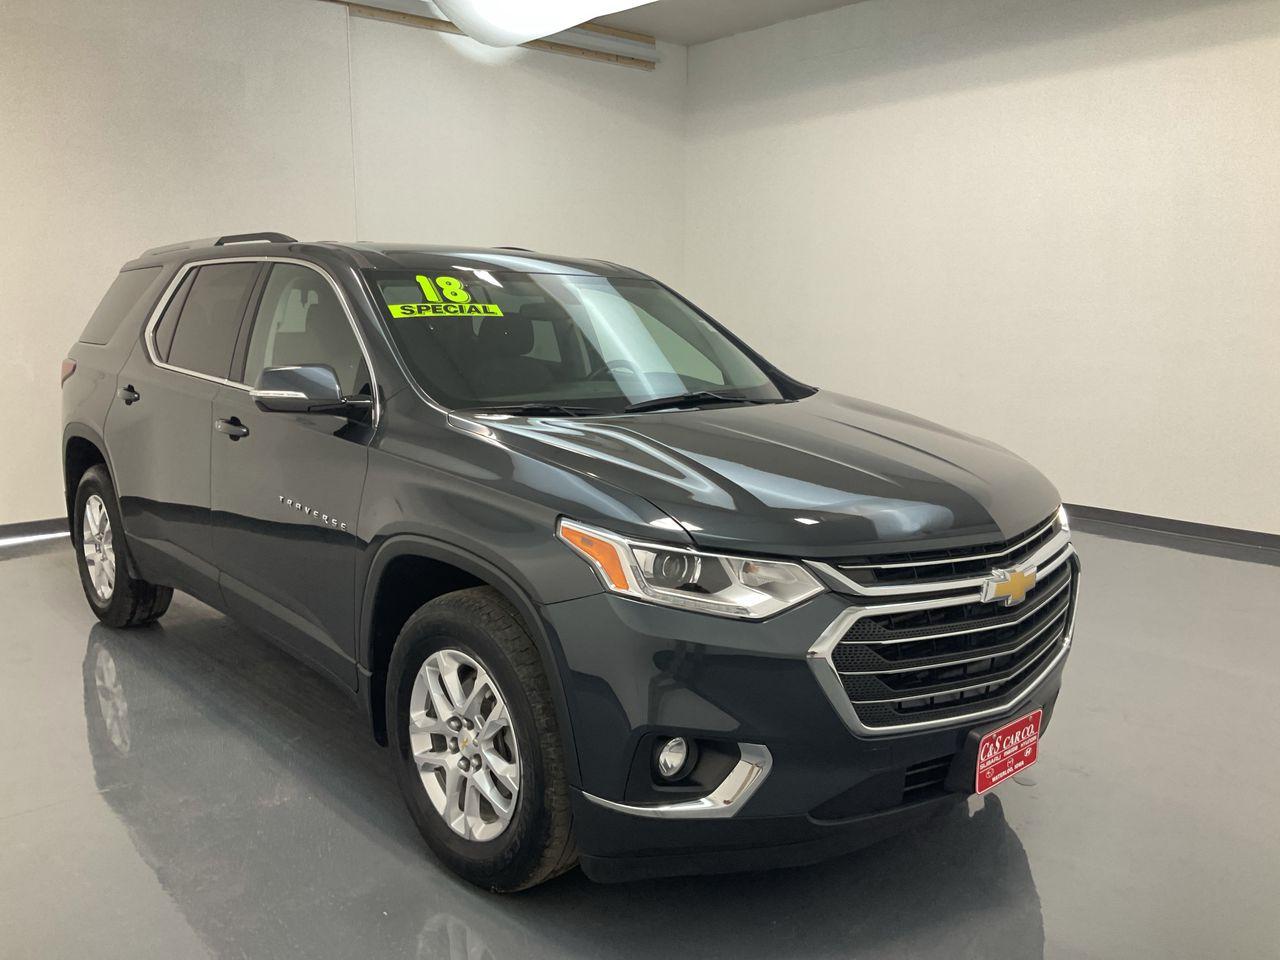 2018 Chevrolet Traverse 4D SUV AWD  - HY8594A  - C & S Car Company